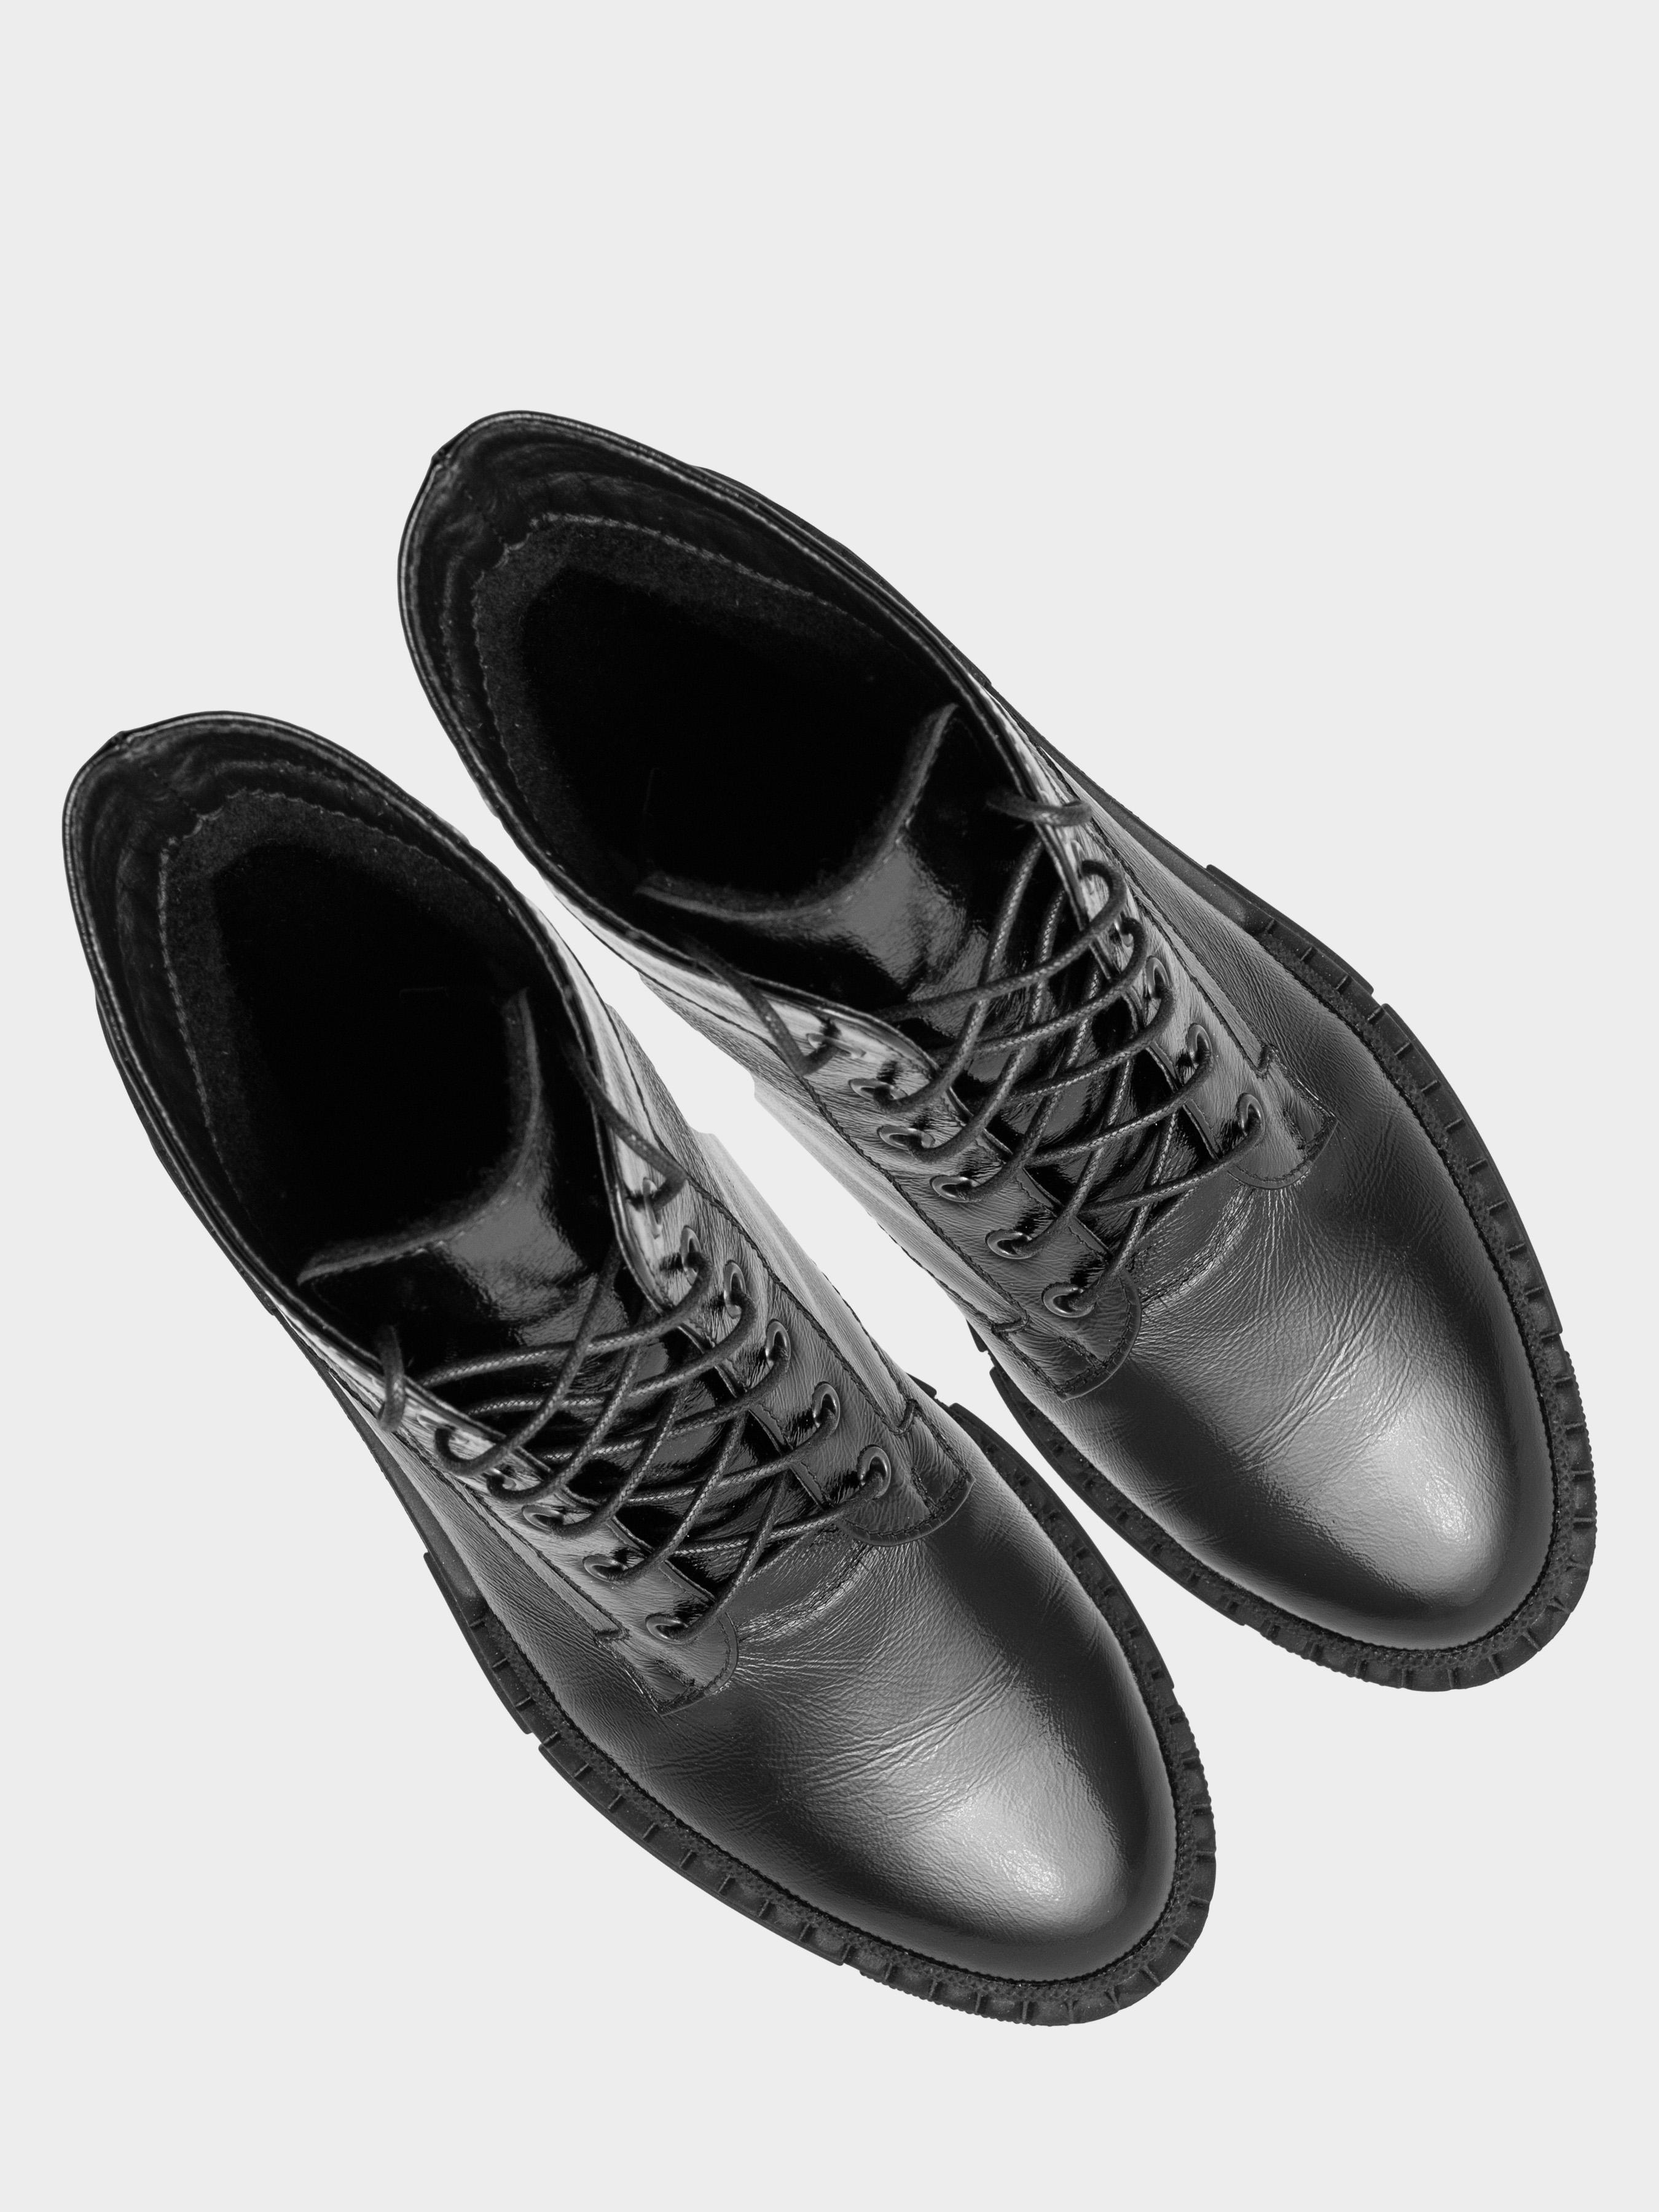 Ботинки для женщин Ботинки женские ENZO VERRATTI 18-7449-3napblack , 2017